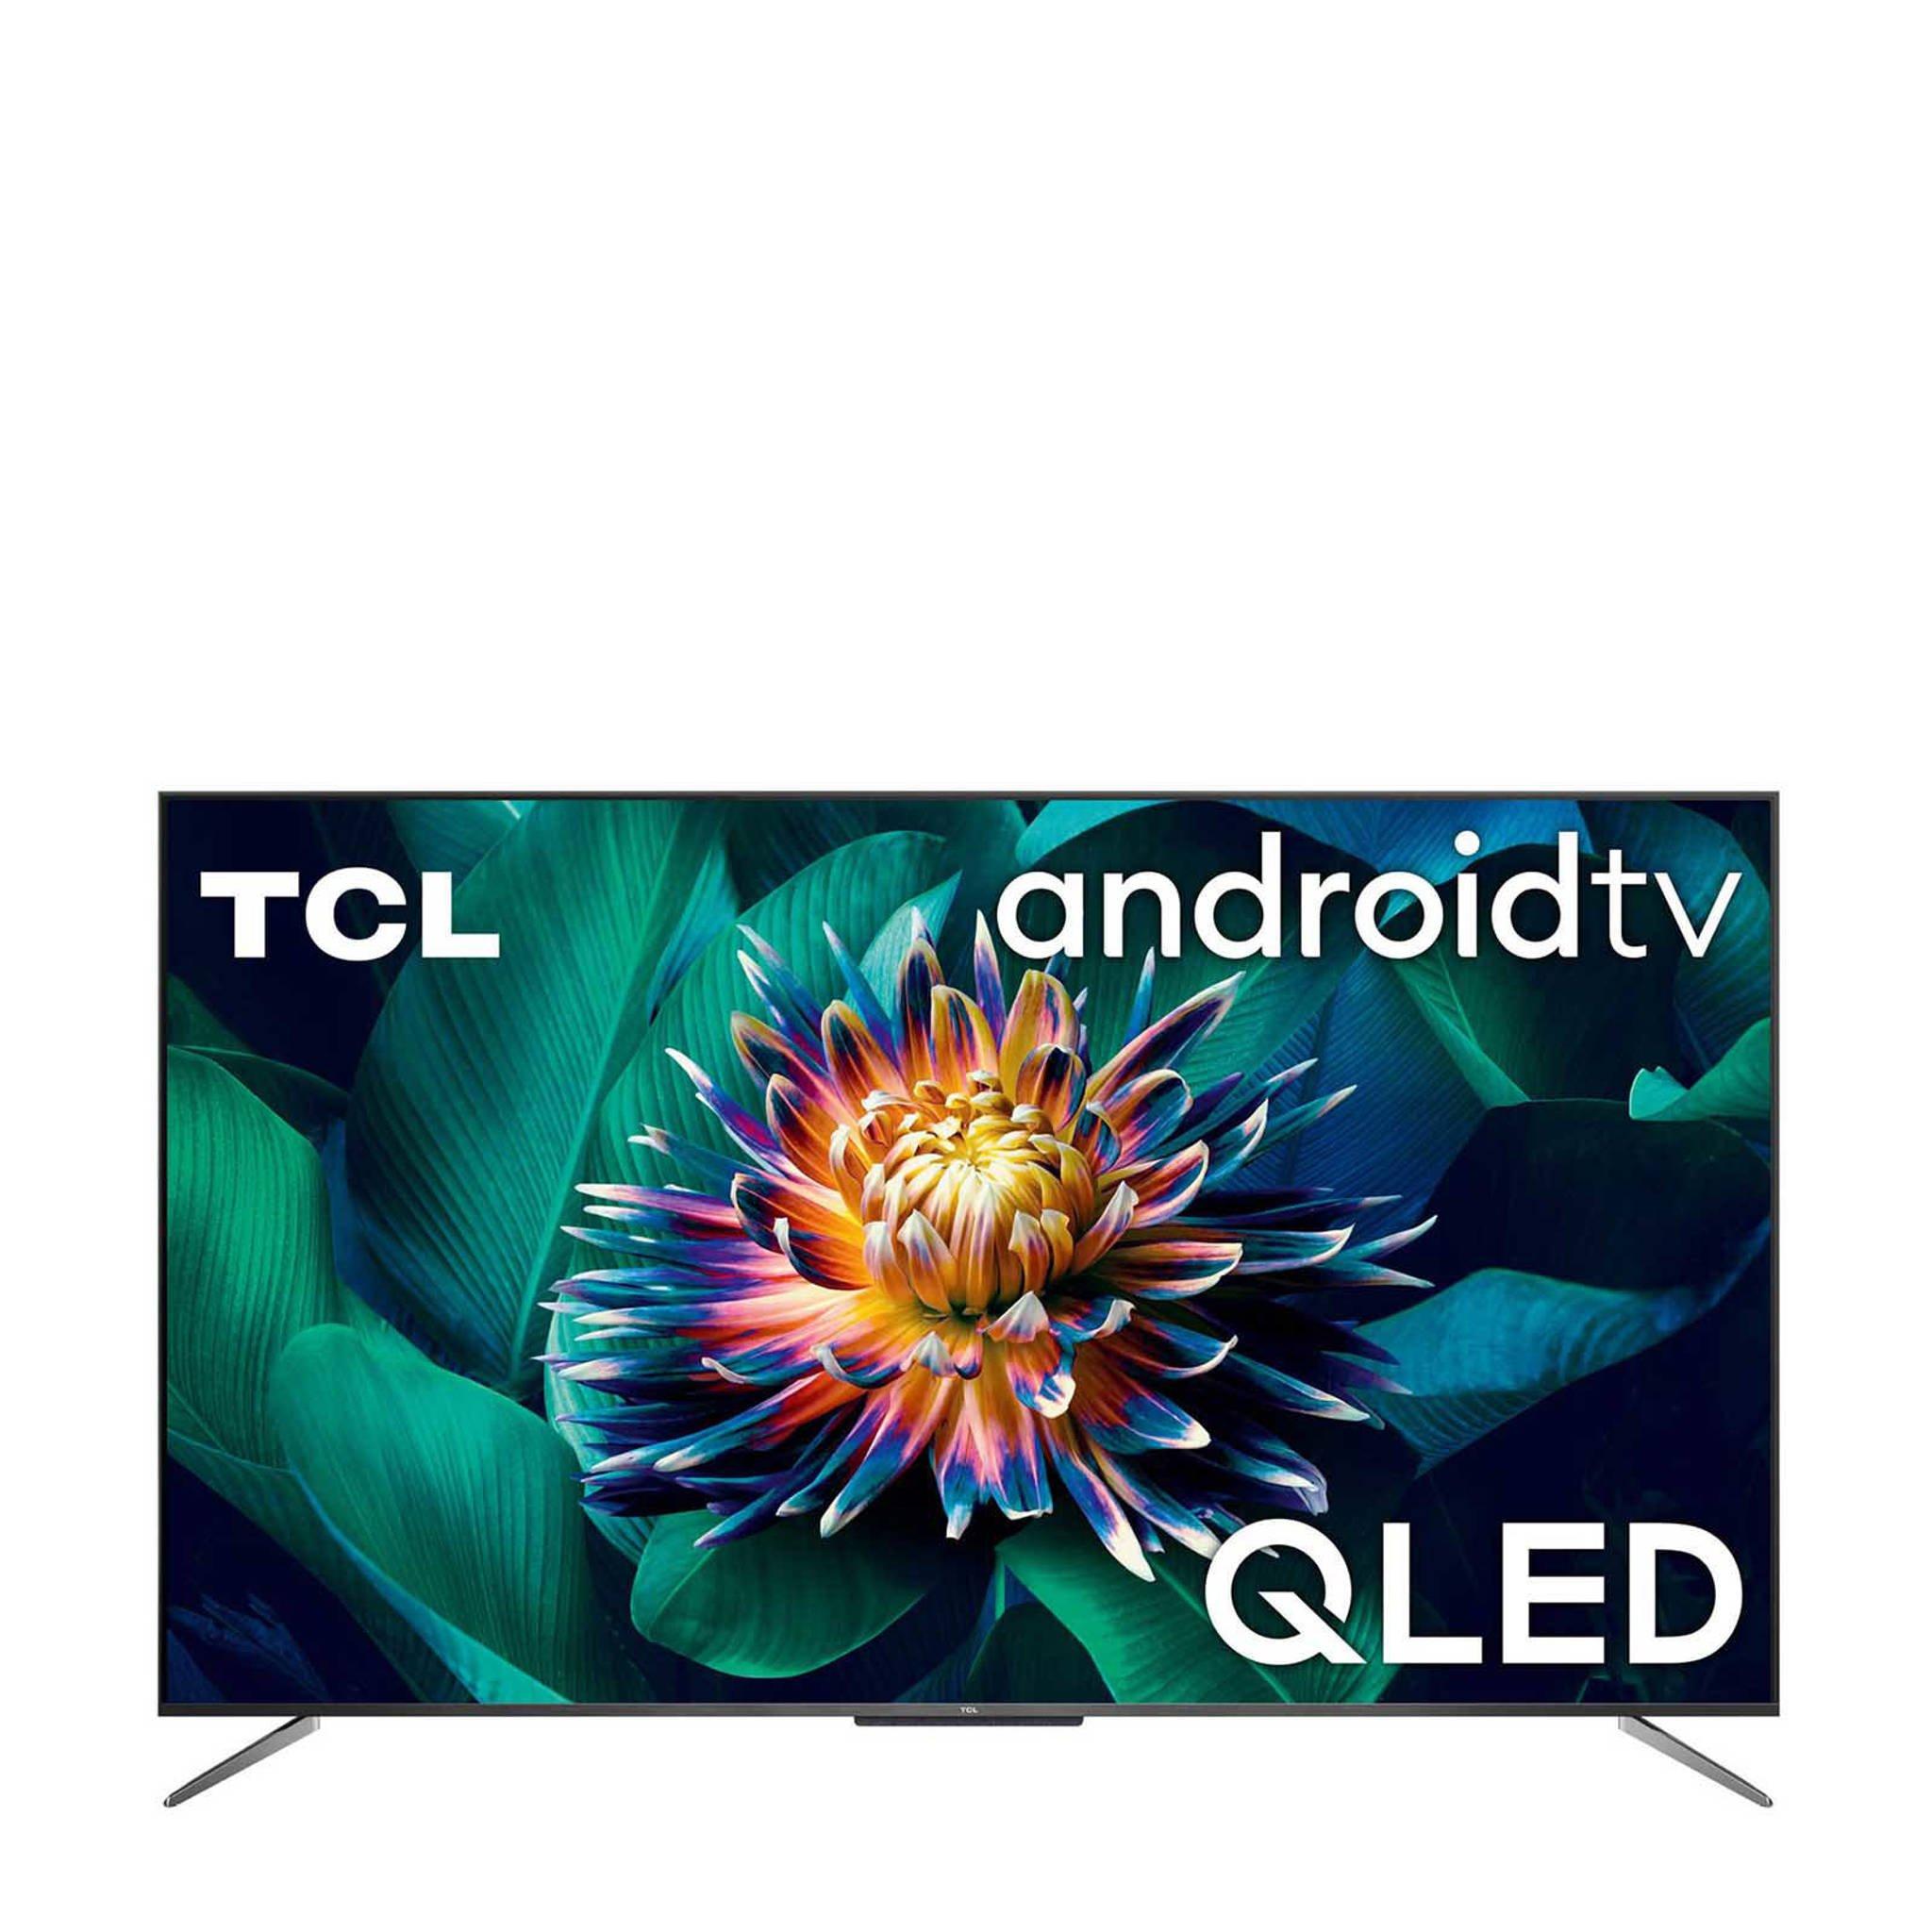 "TCL 65C715 65"" 4K Ultra HD QLED TV voor 699,- (inclusief 75,- cashback)."